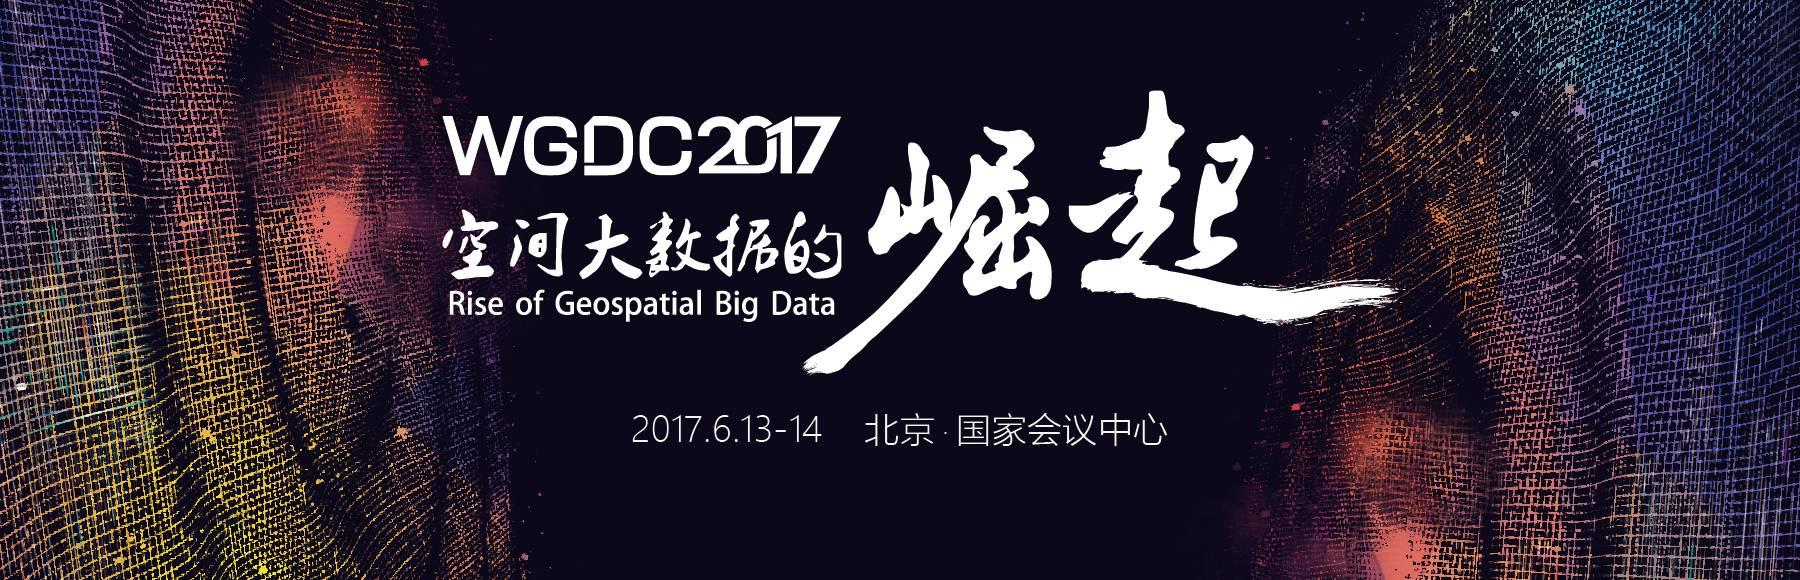 WGDC大会再次登陆,带你玩转空间大数据